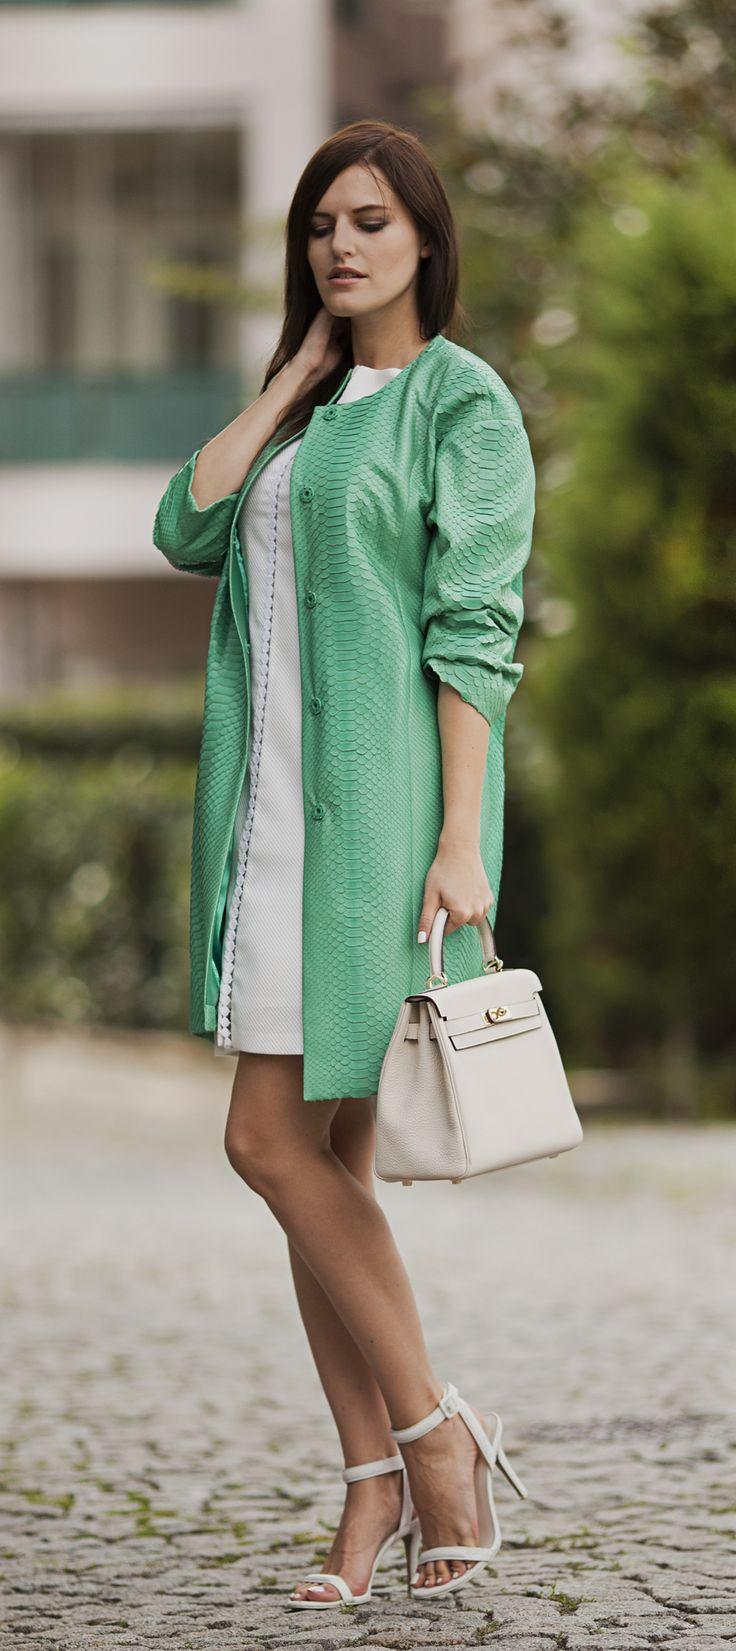 Python leather mint green trench-coat by #ADAMOFUR #luxury #shopping #Istanbul #style #inspiration #elegant #pastel #leather #chic